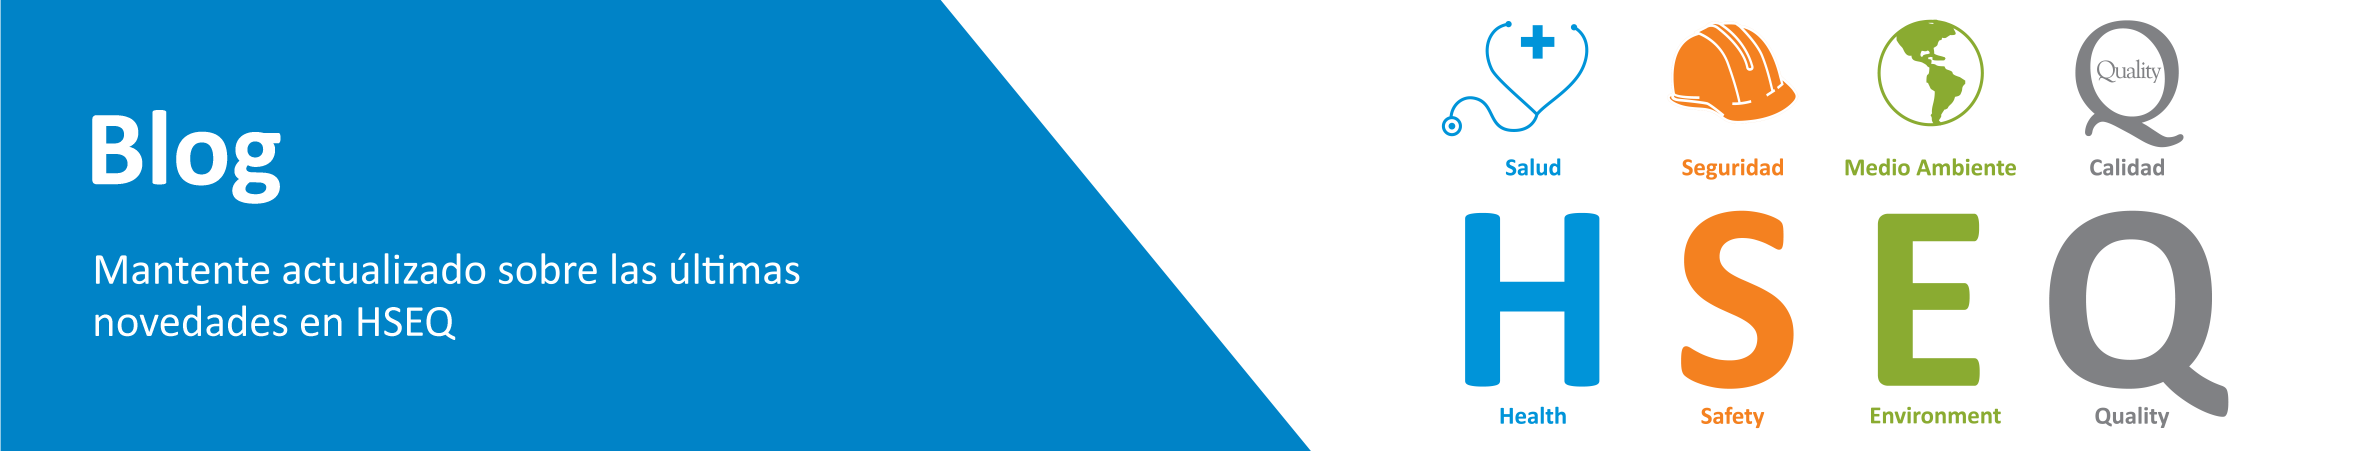 banner_blog2015